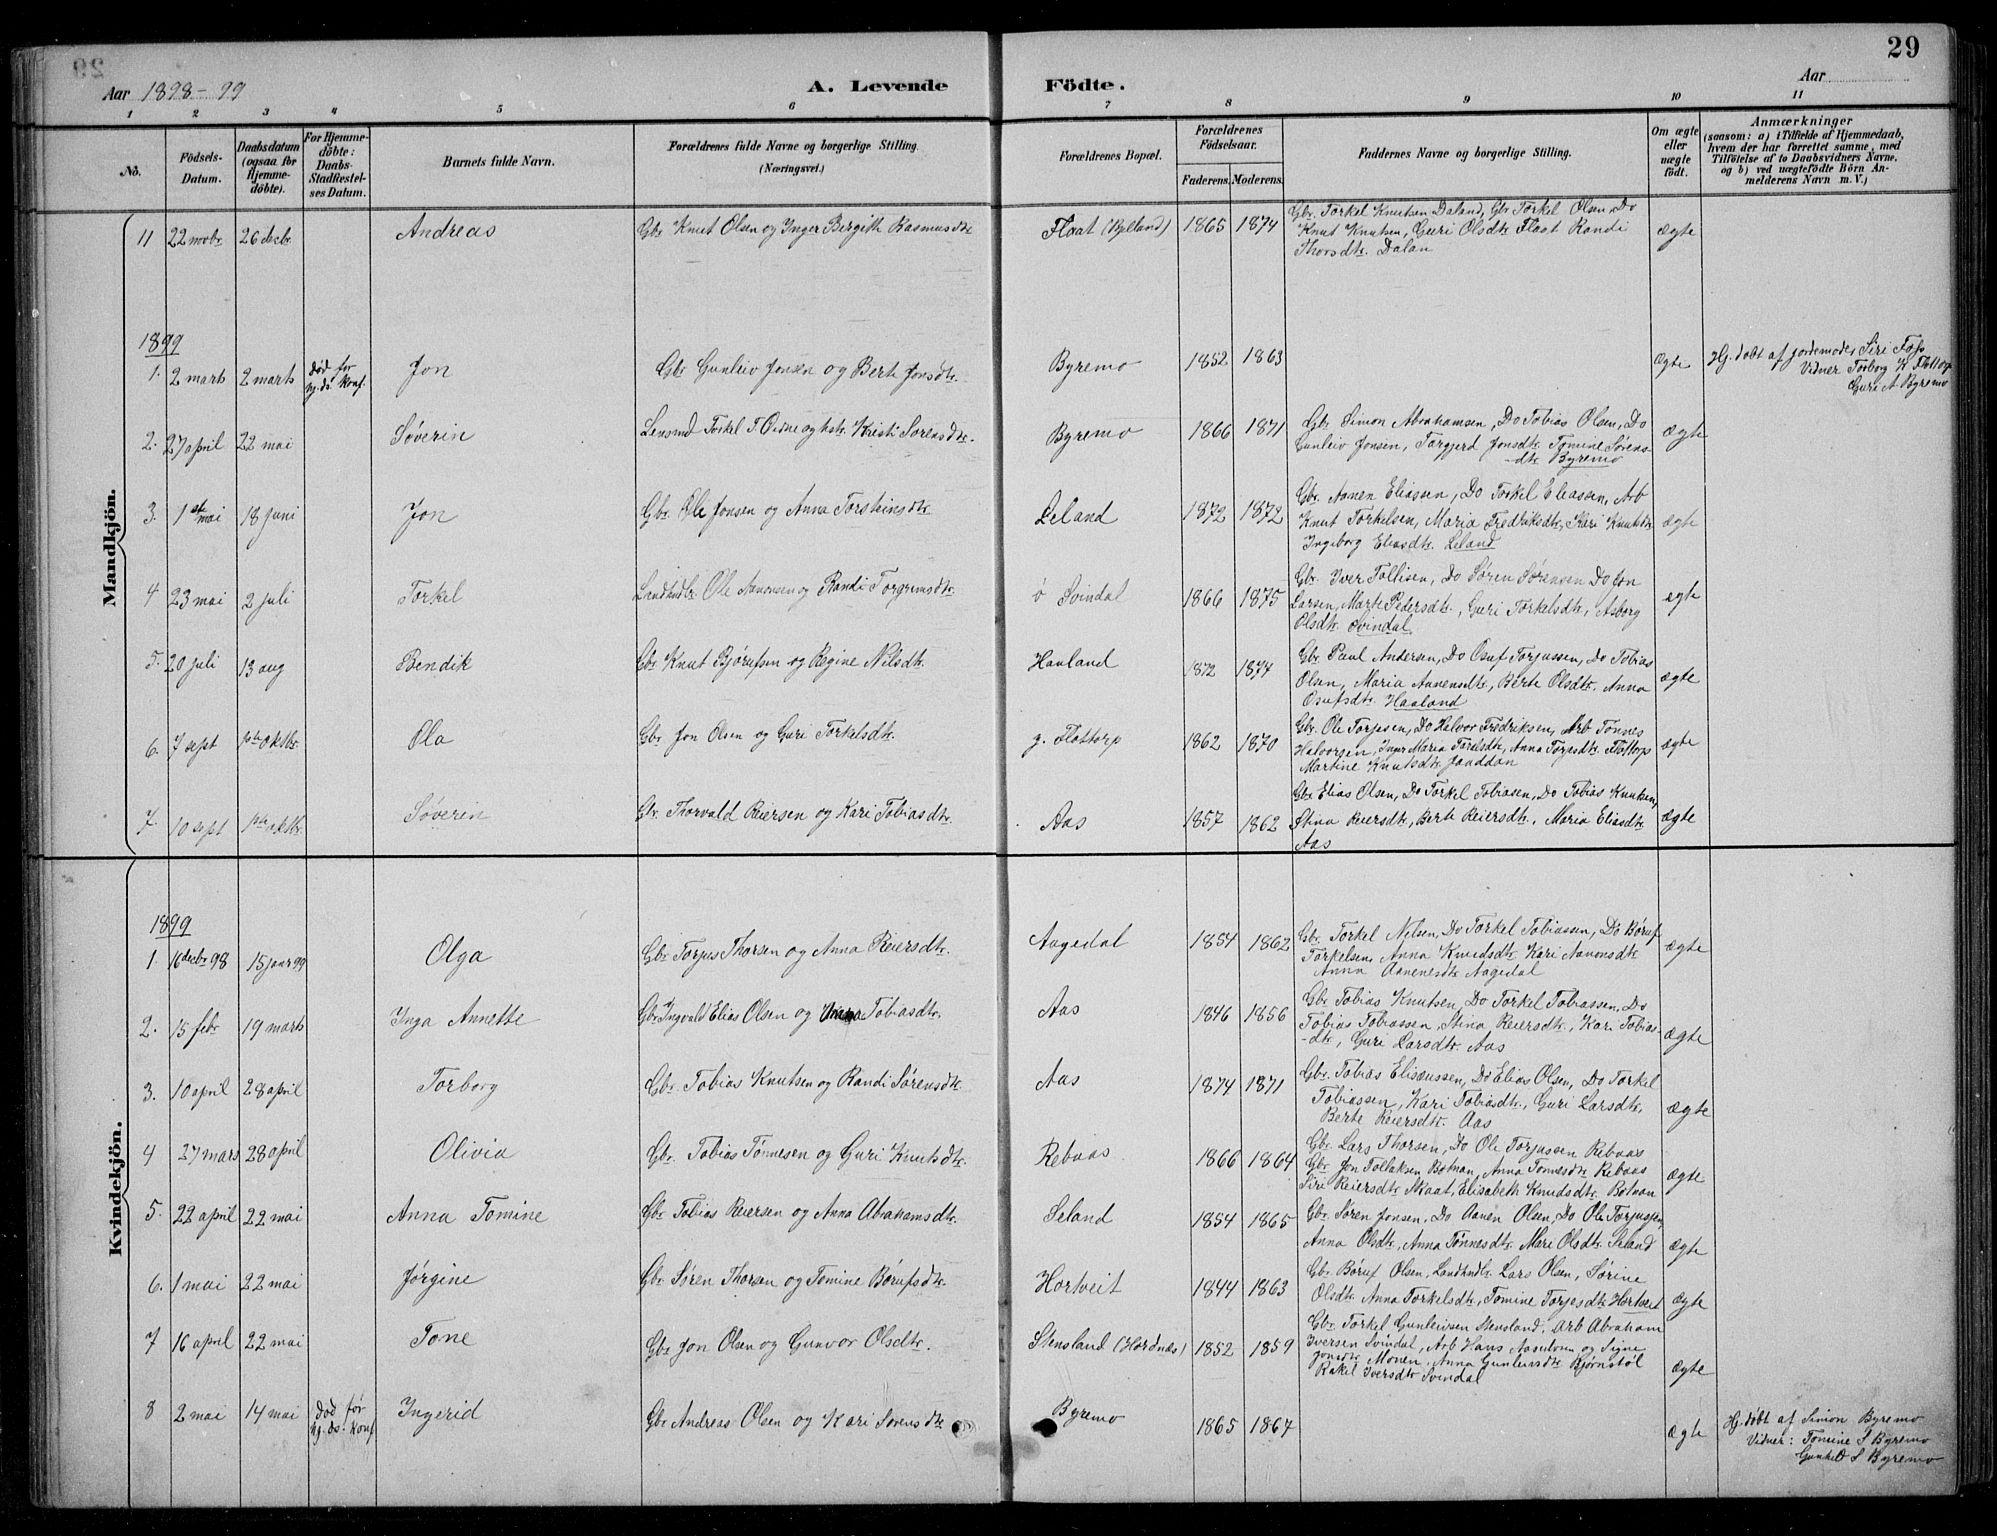 SAK, Bjelland sokneprestkontor, F/Fb/Fbc/L0003: Klokkerbok nr. B 3, 1887-1924, s. 29